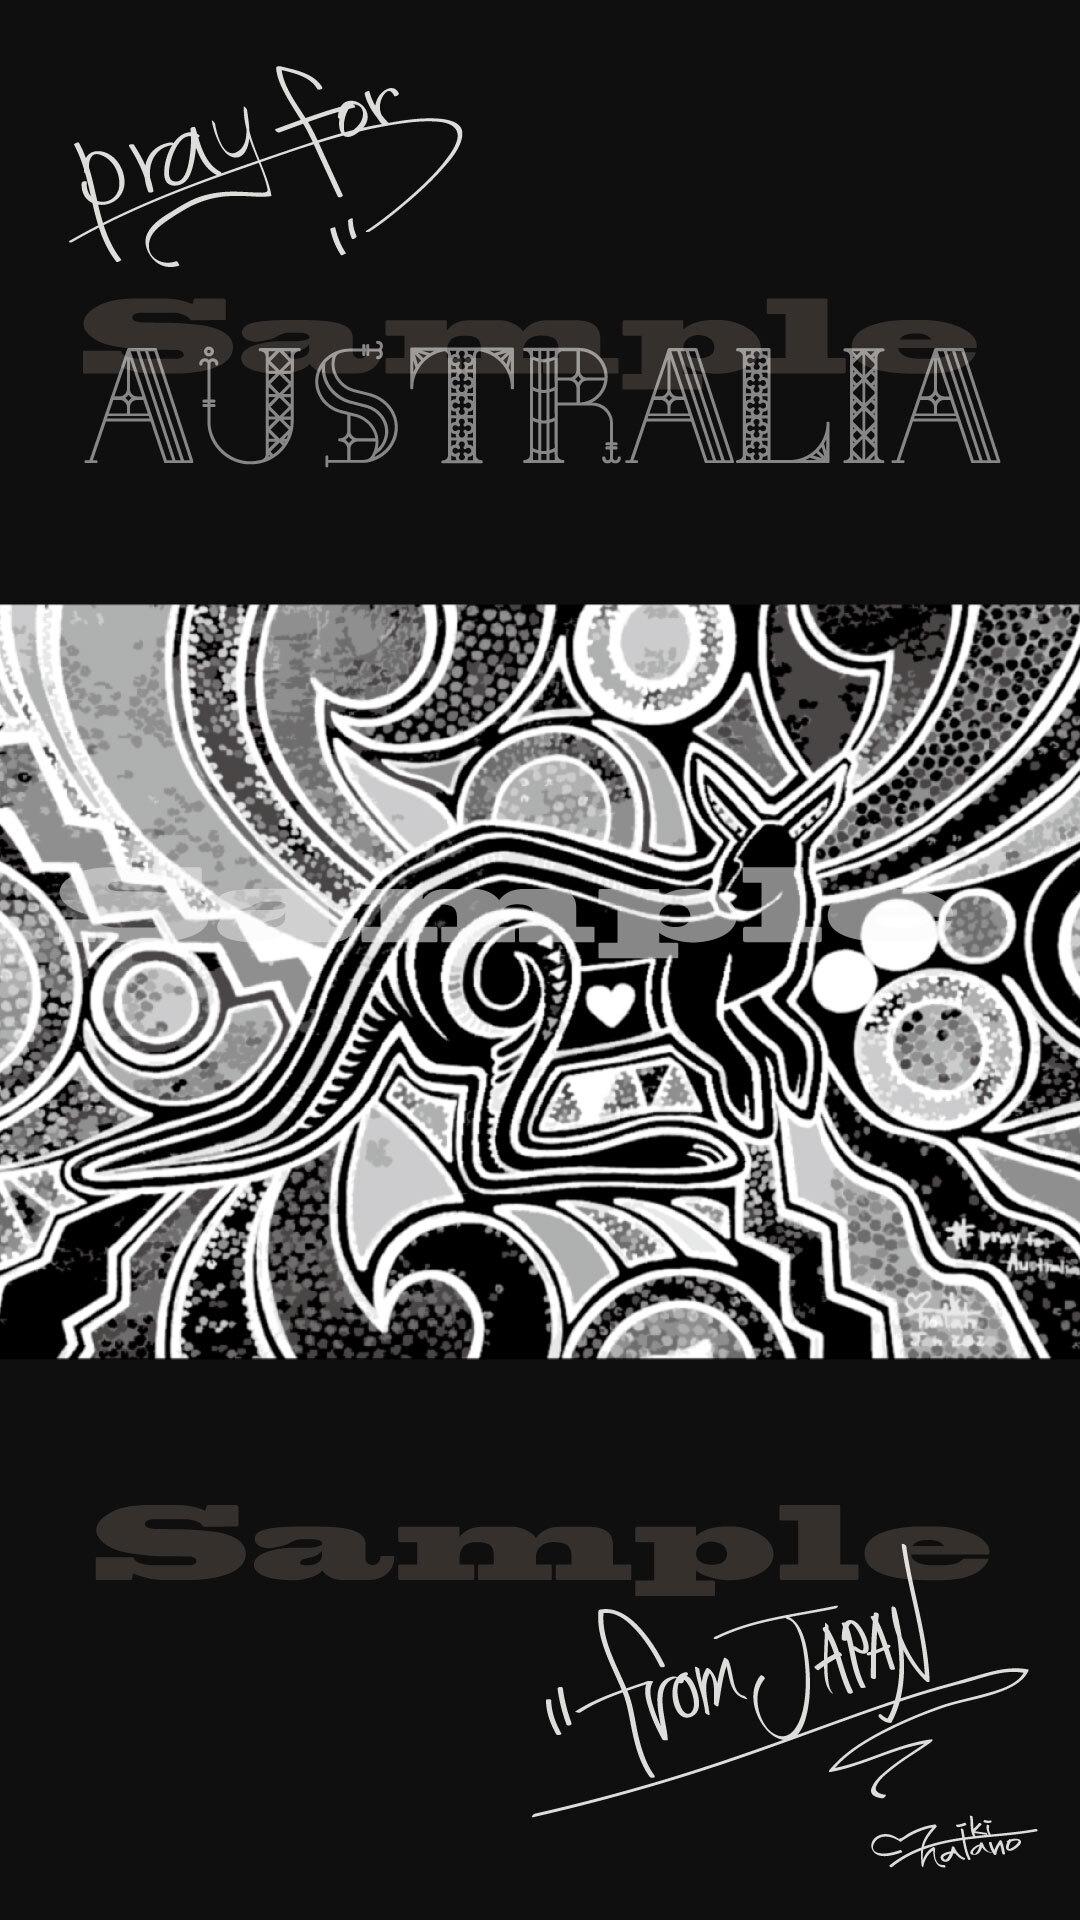 Pray for Australia 3-B (1920x1080 pixel)